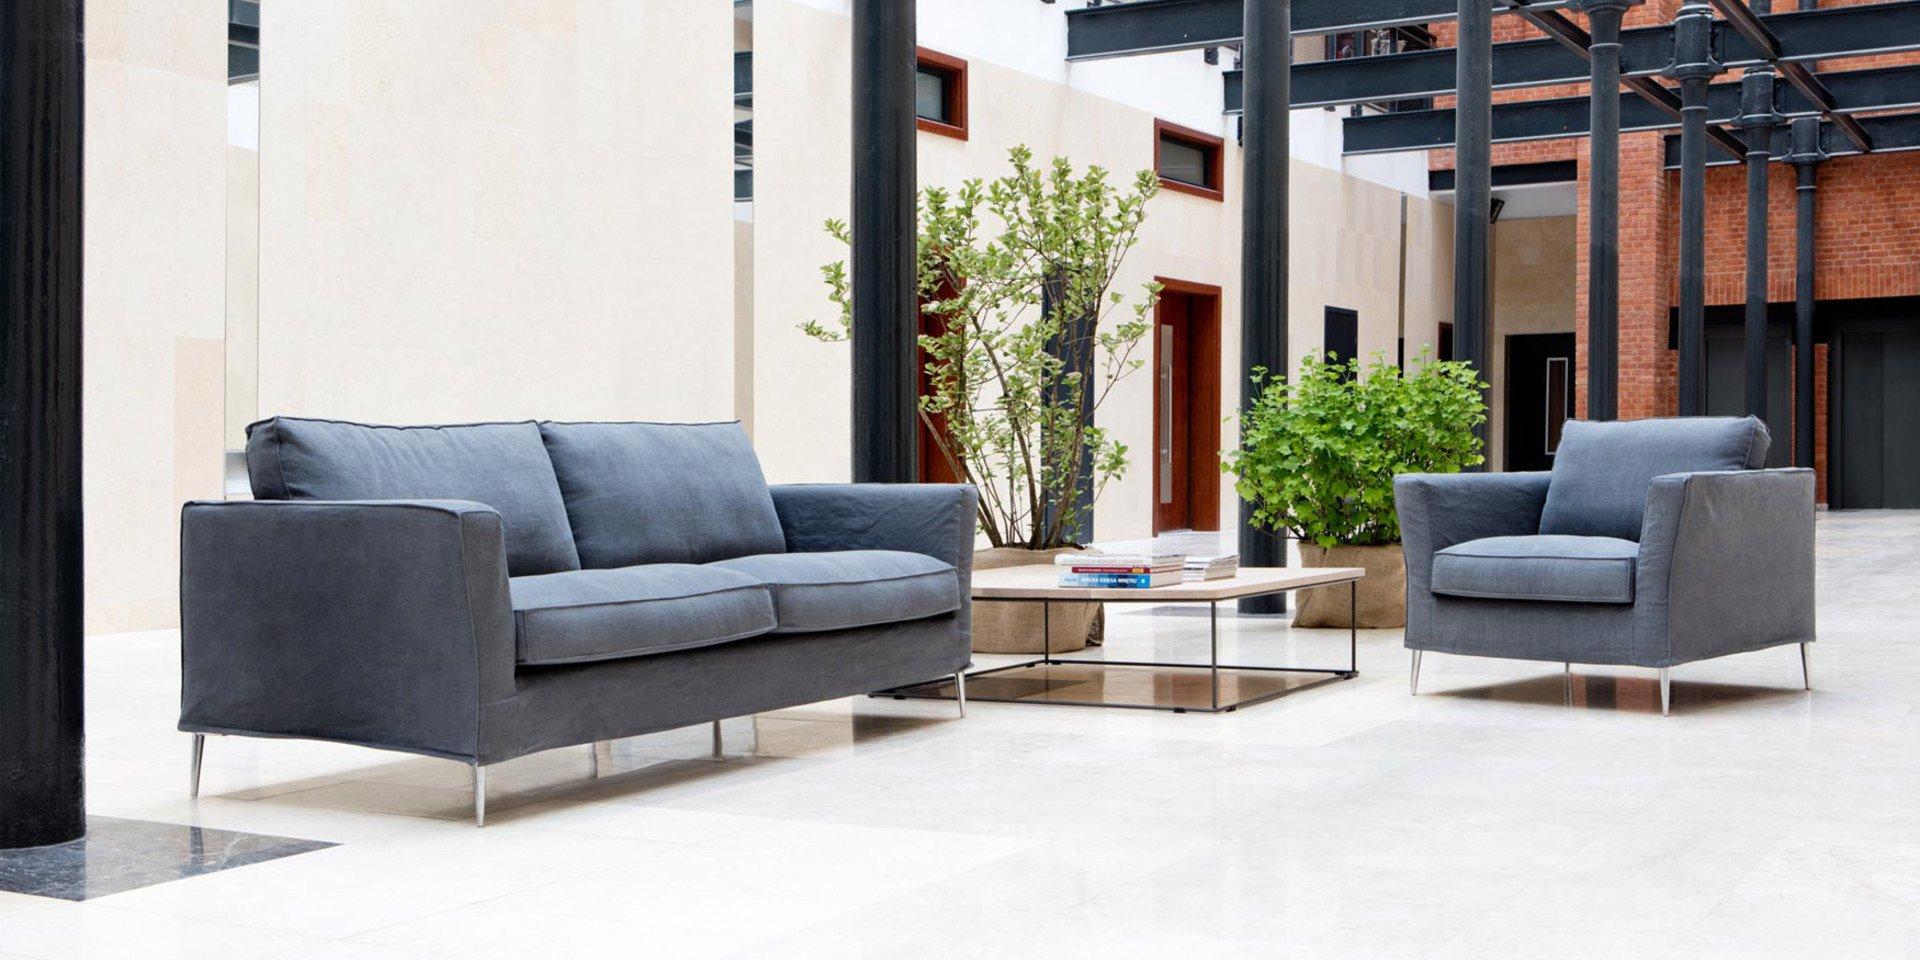 Caprice Sofa Grey